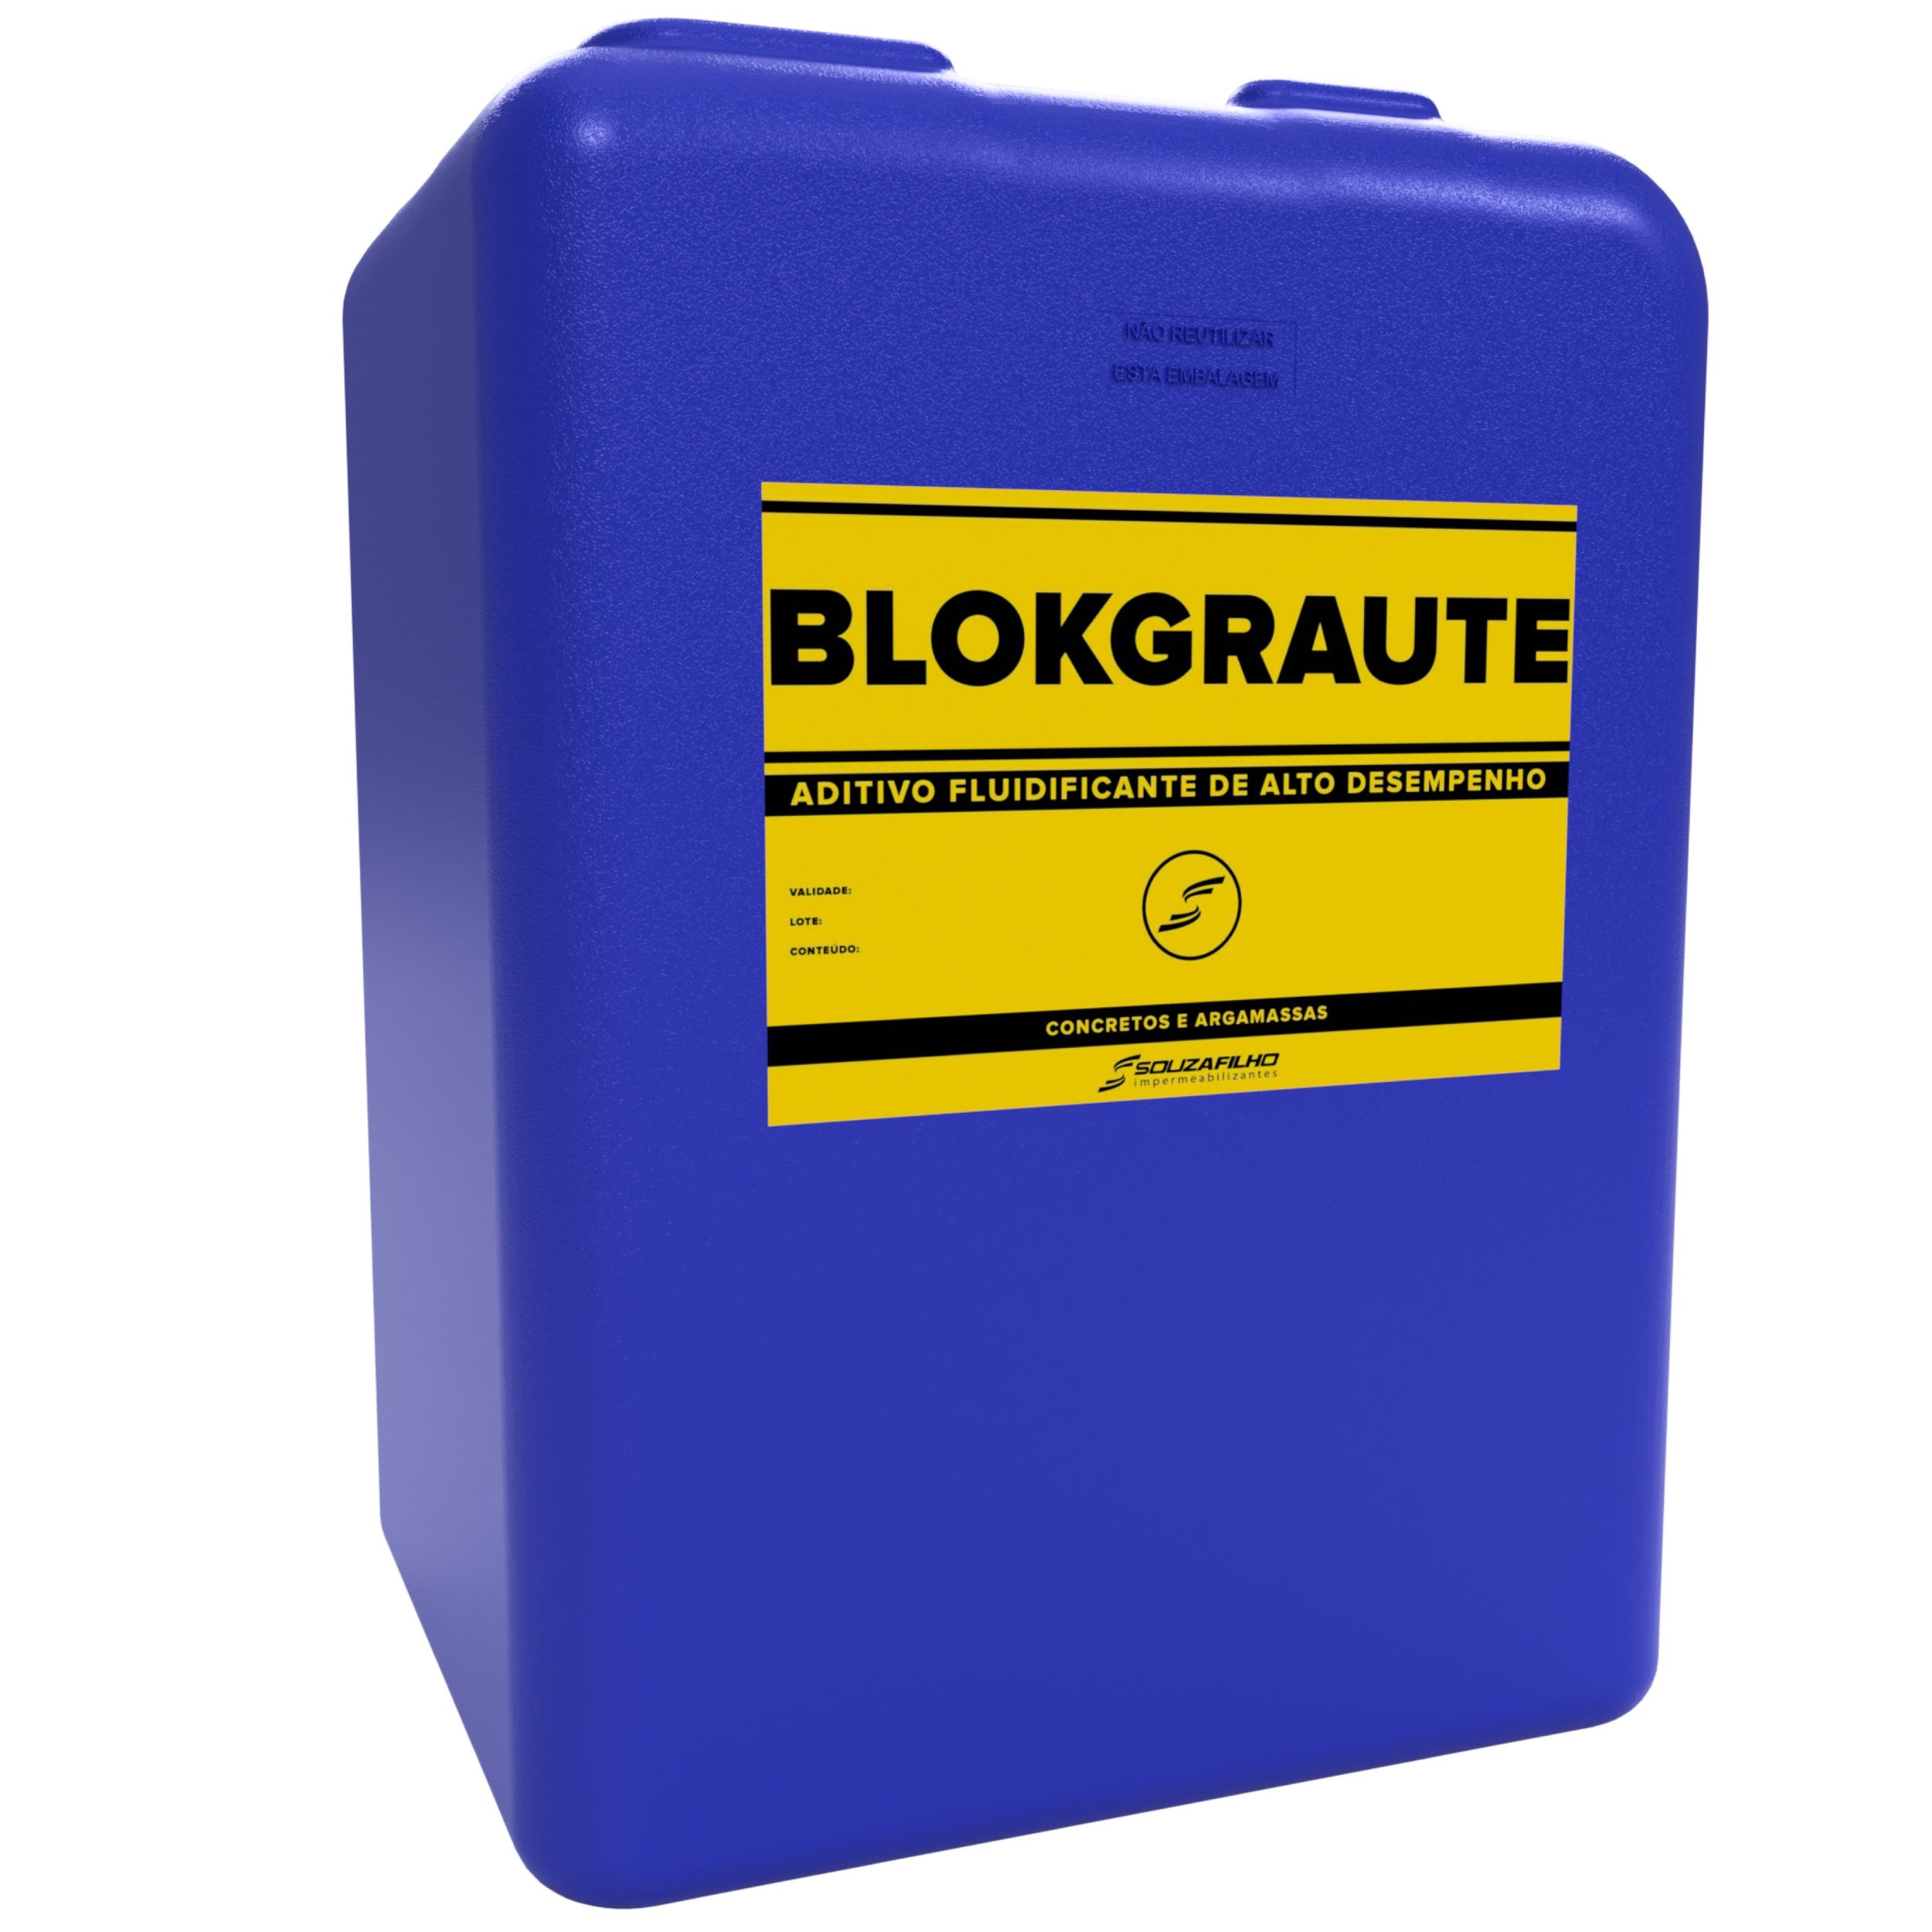 blokgraute_hiperplastificante_fluidificante_graute.jpg